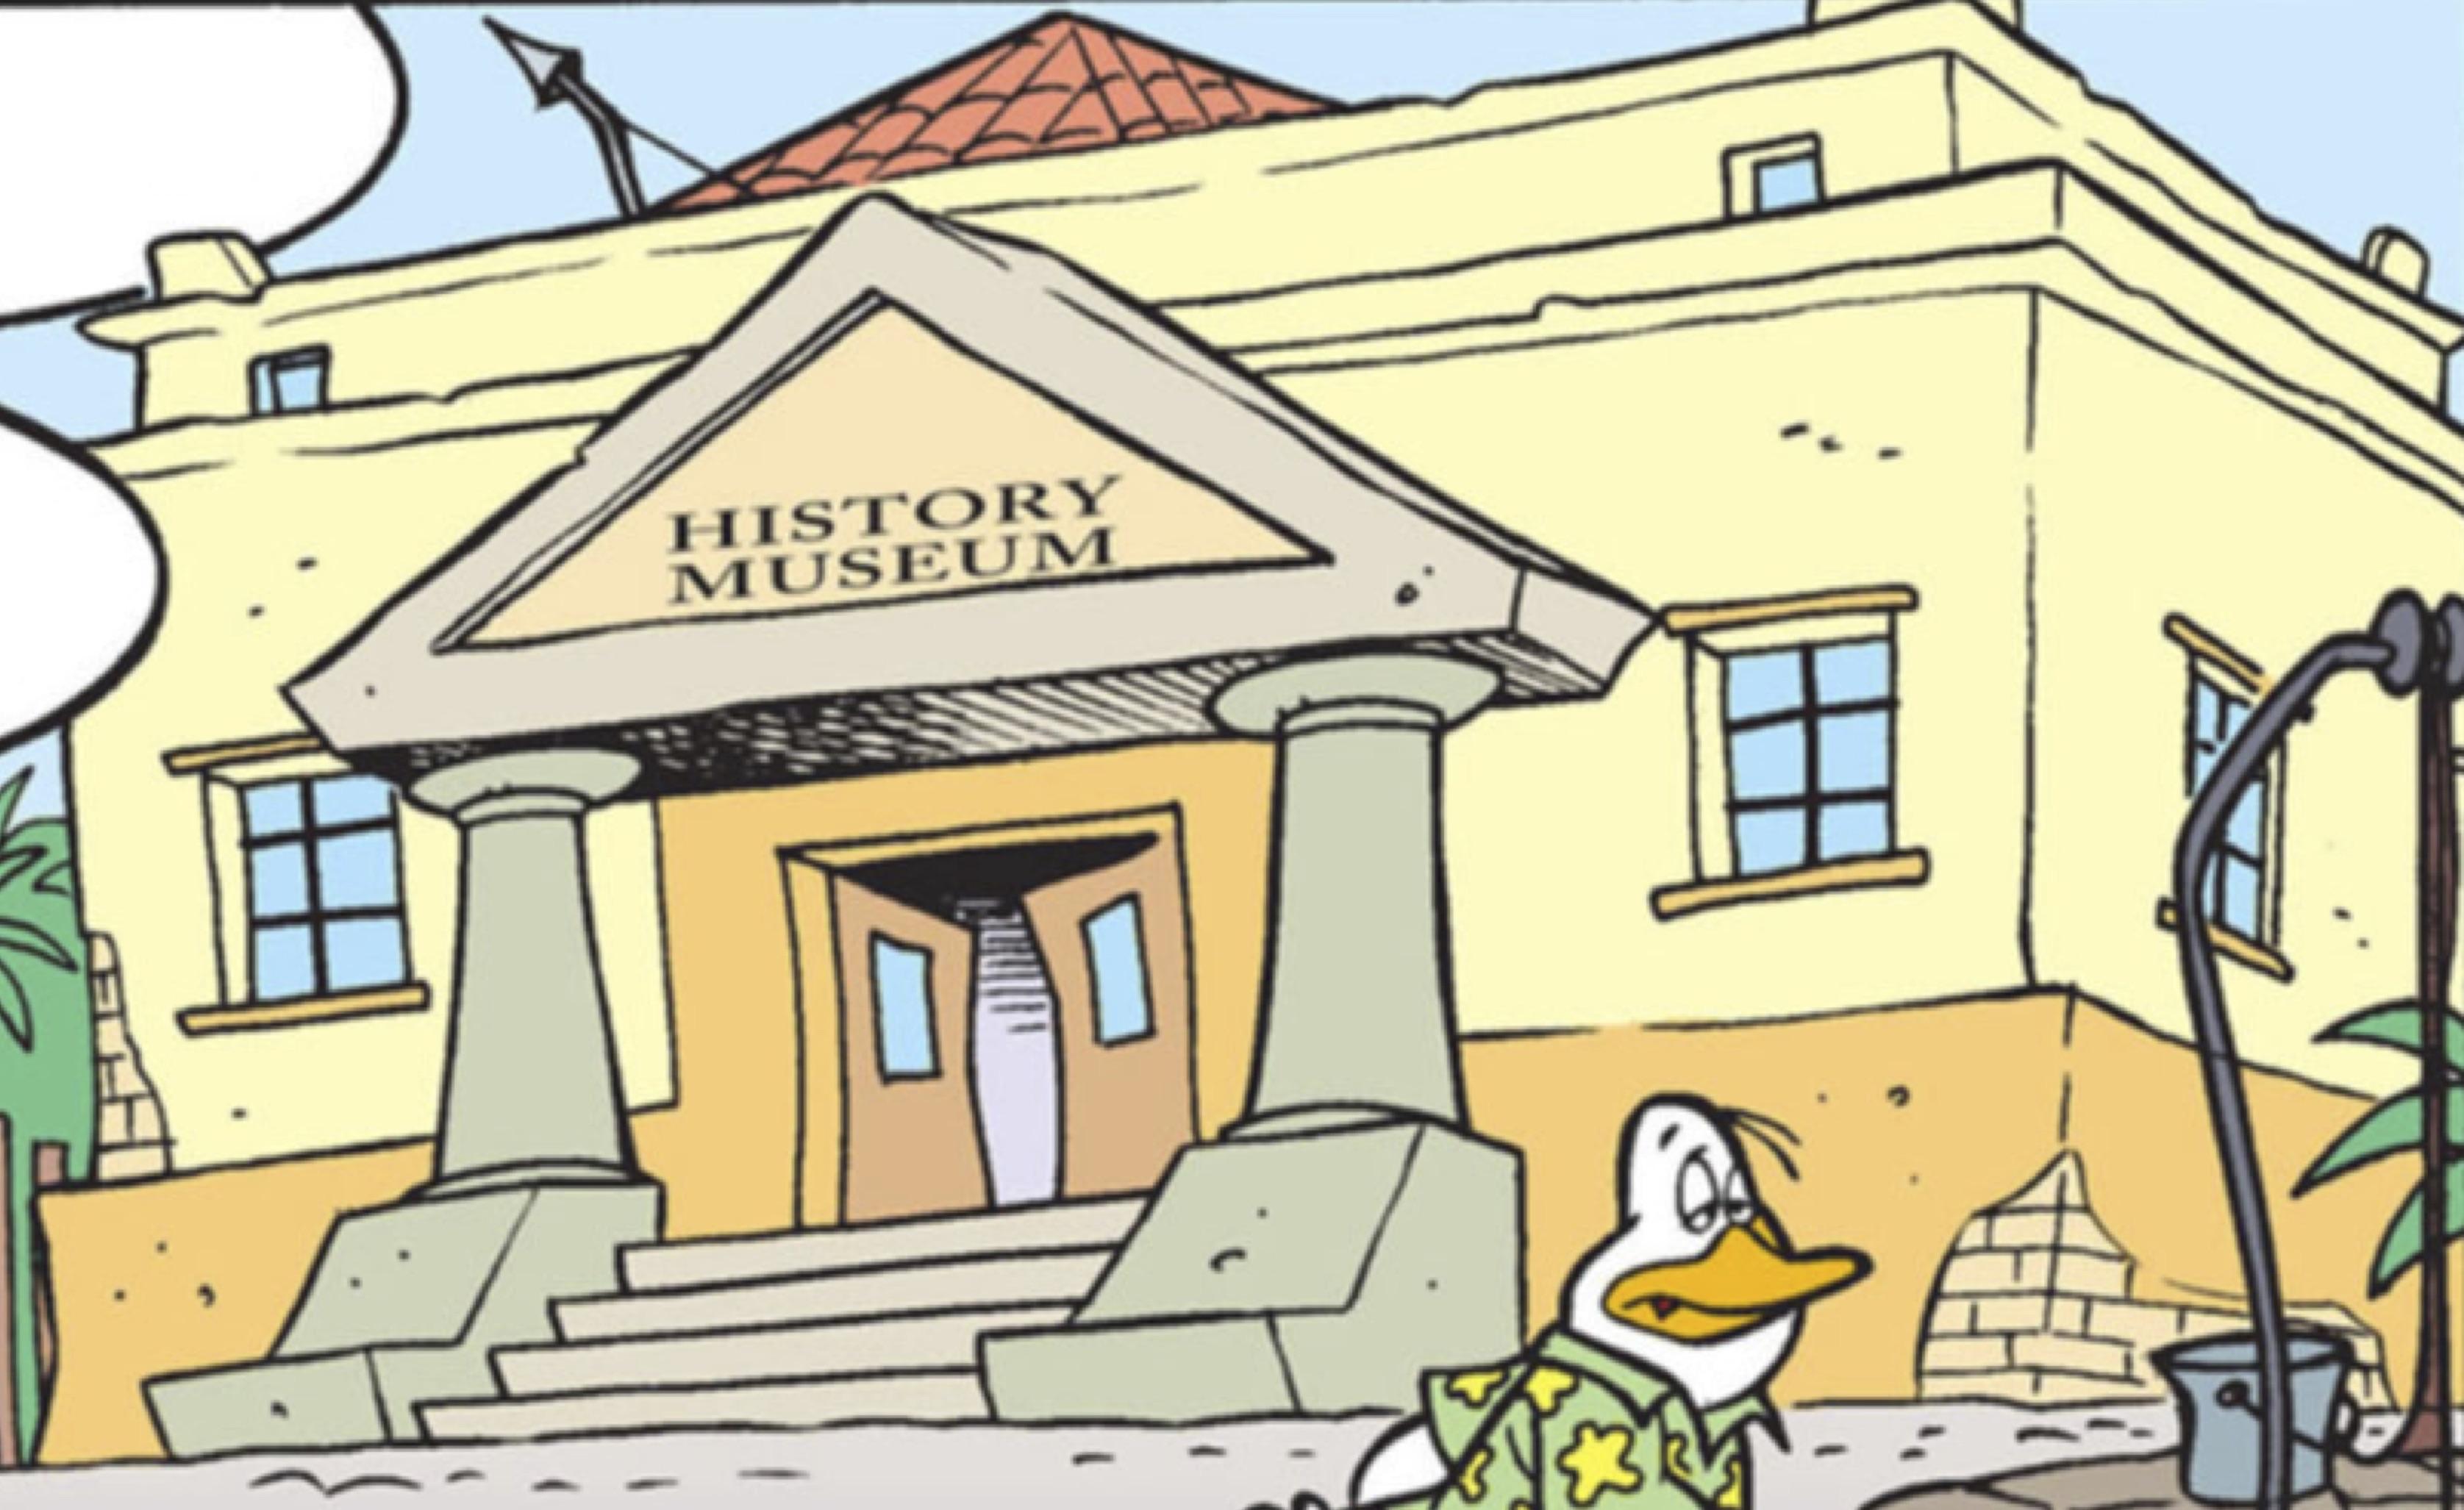 Drakehete History Museum